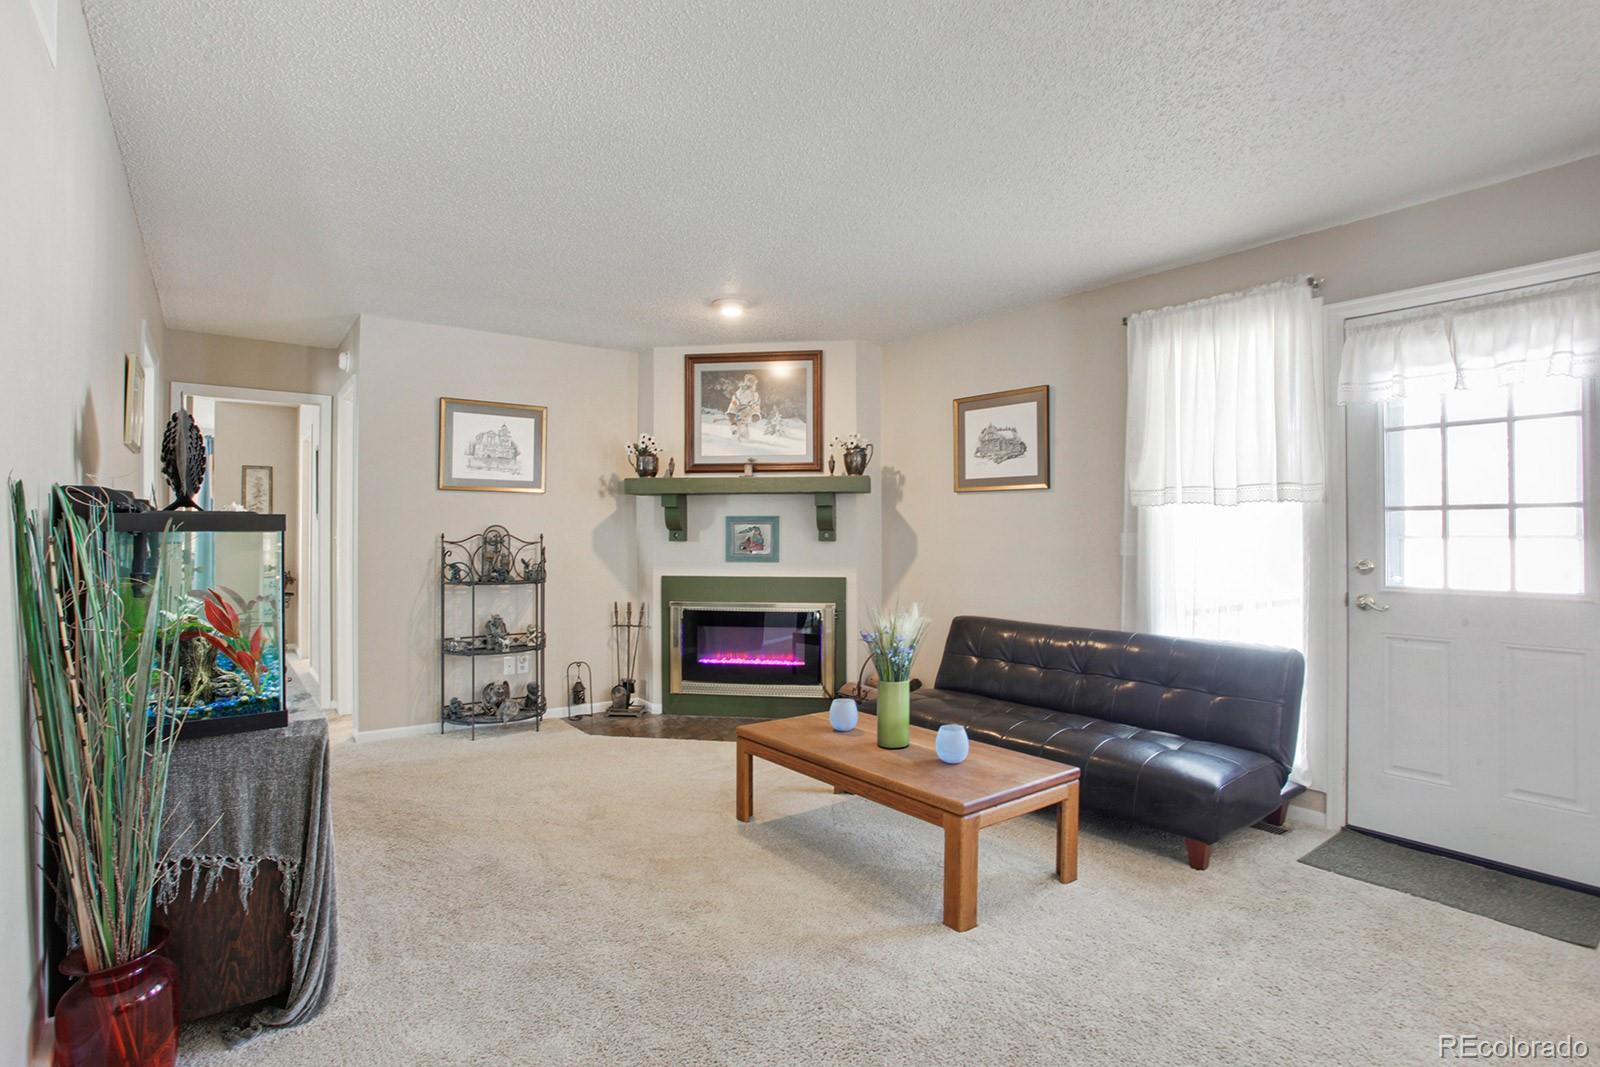 MLS# 6982689 - 5 - 61 E Ruth Road, Broomfield, CO 80020